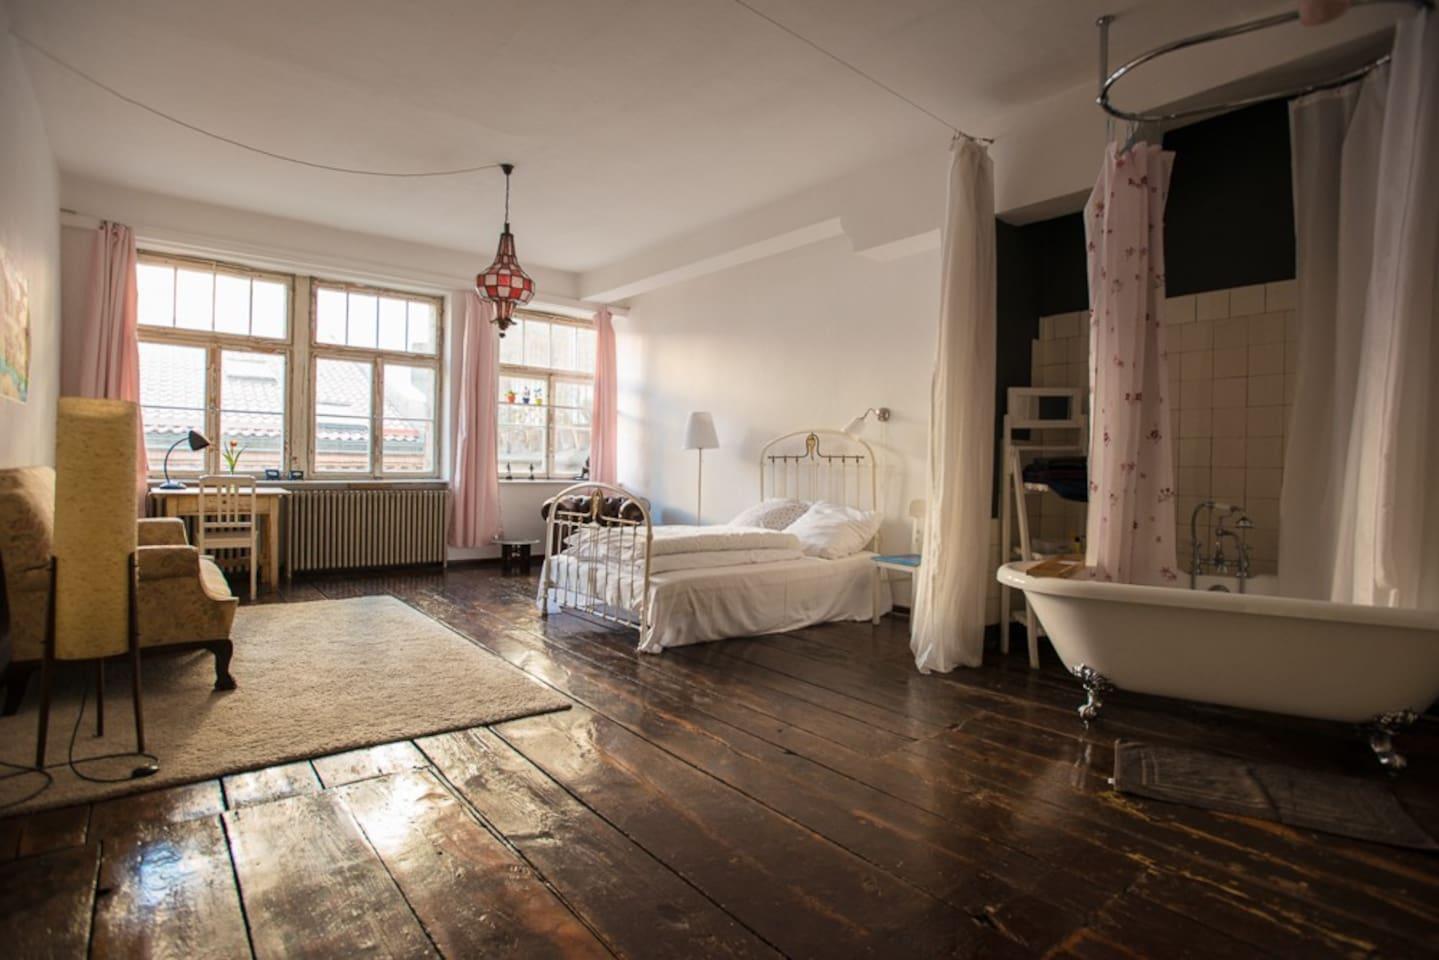 Bedroom with the bathtub.